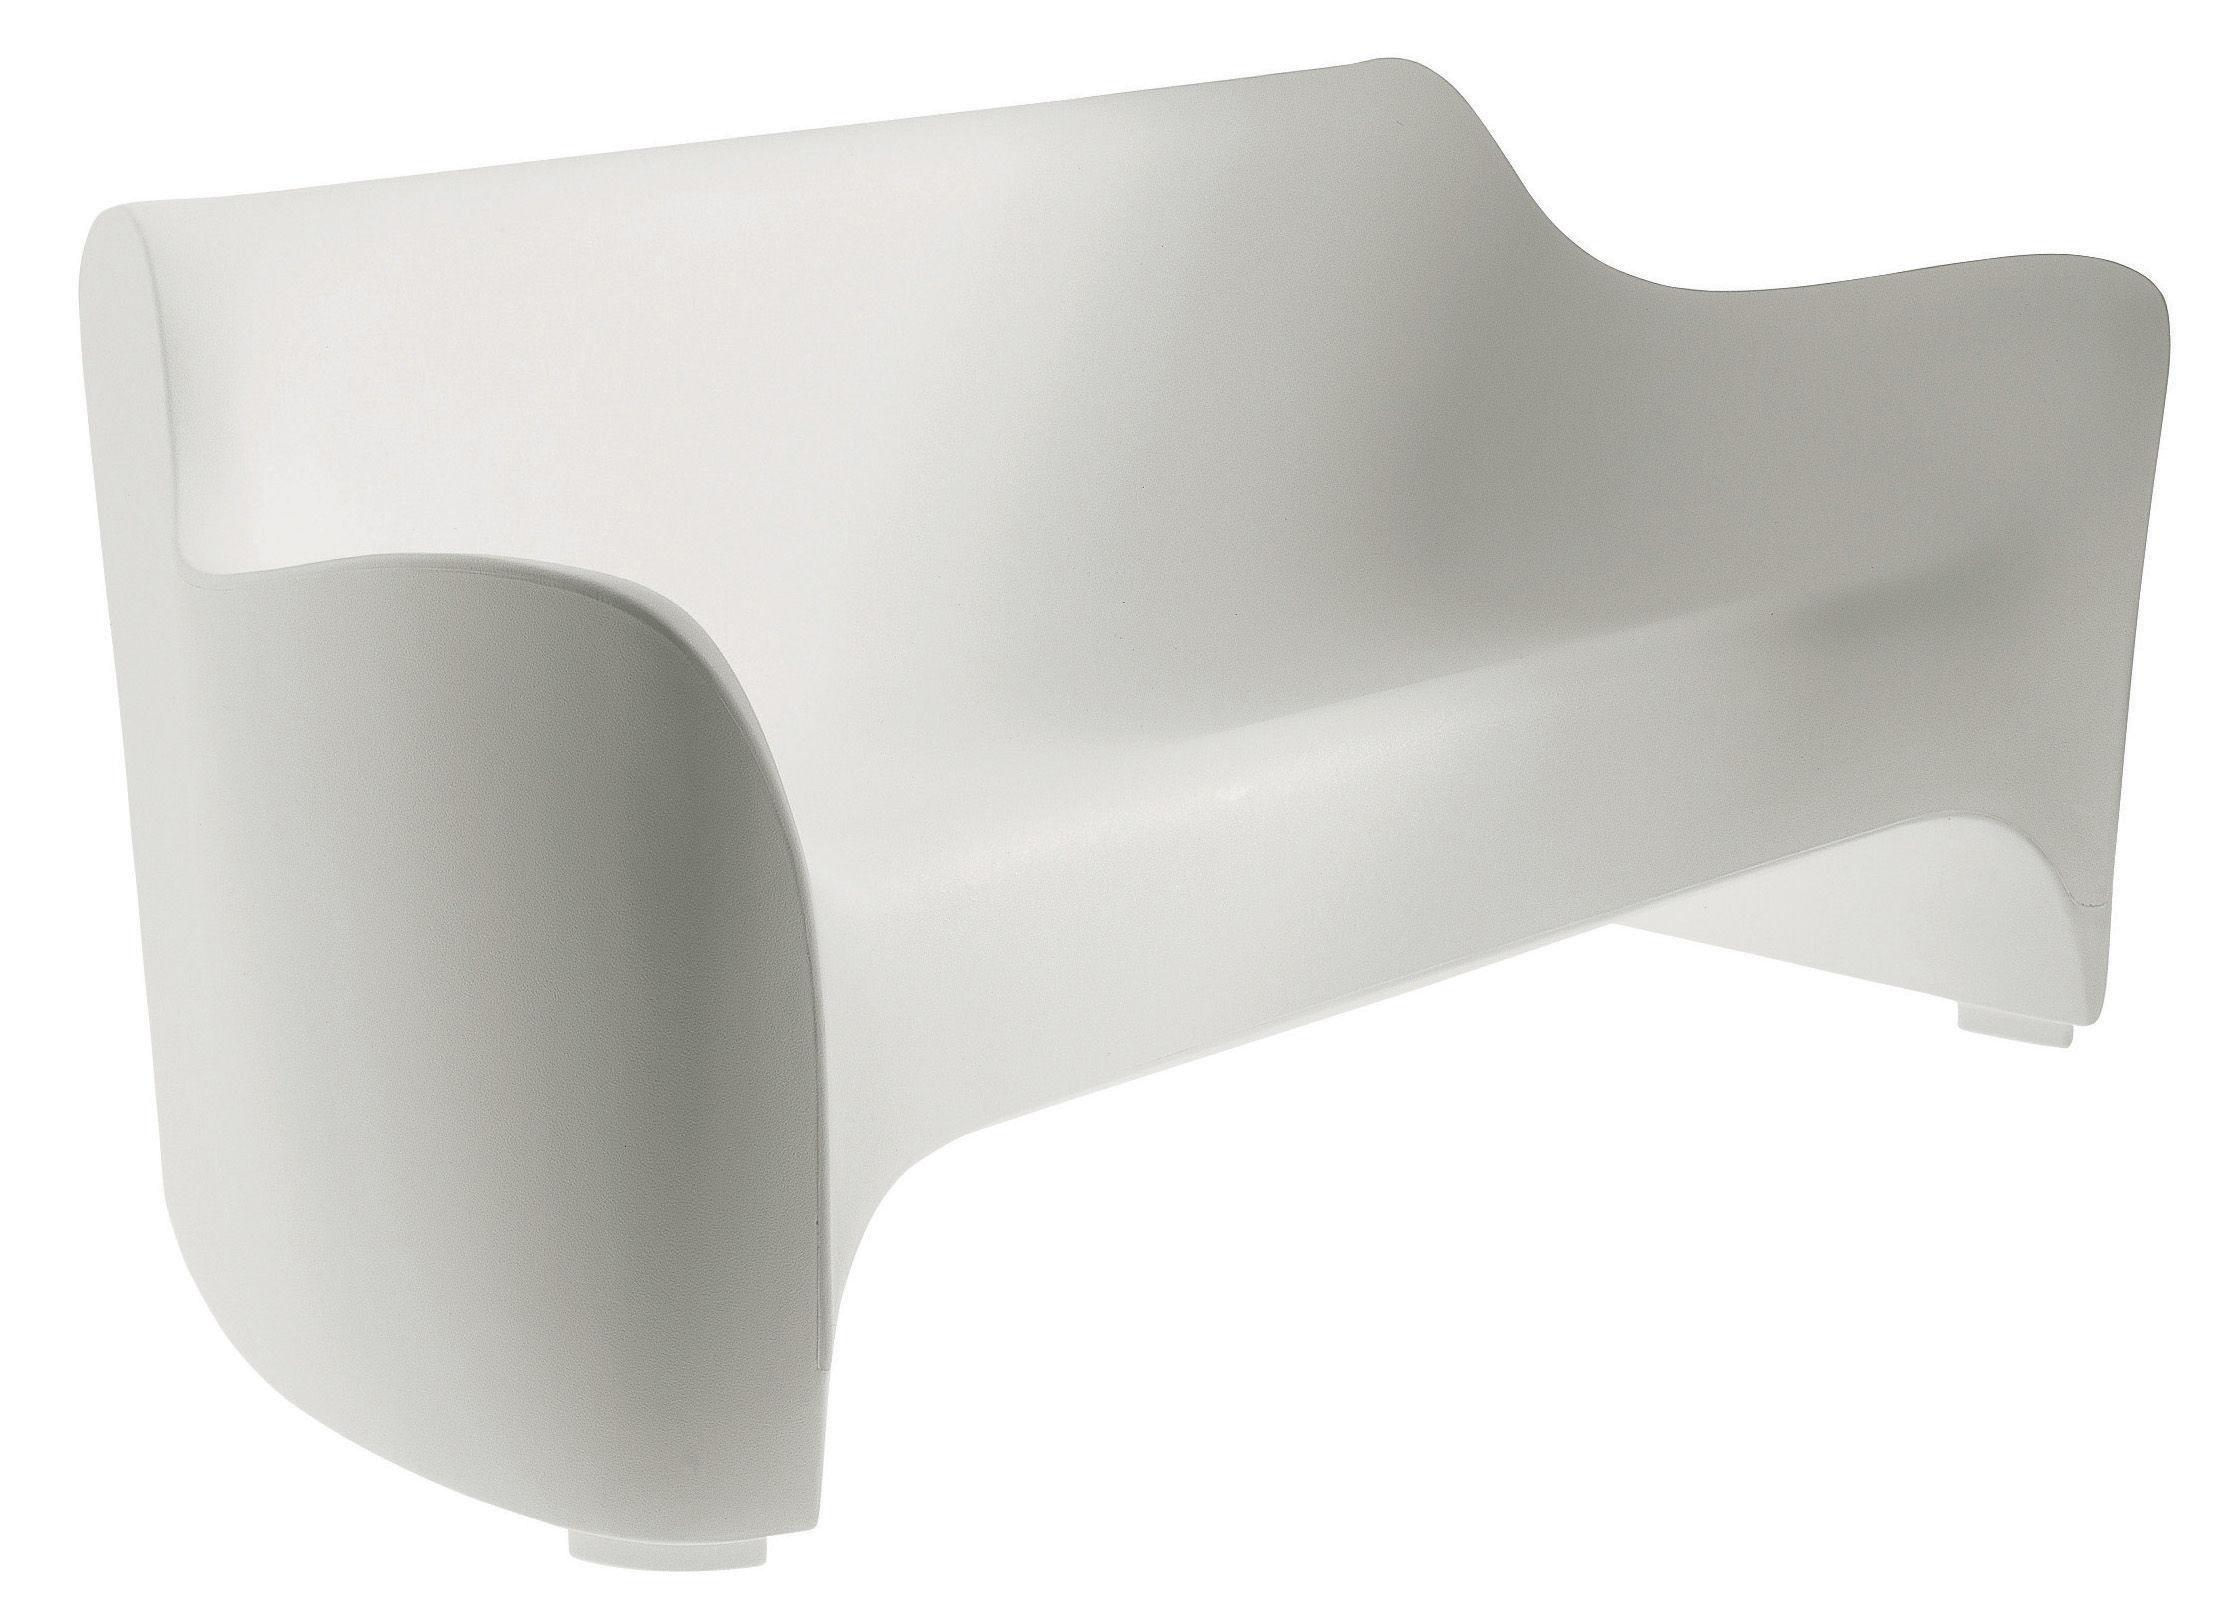 Jardin - Canapés - Canapé droit Tokyo Pop / L 177  cm - Driade - Blanc - Polyéthylène